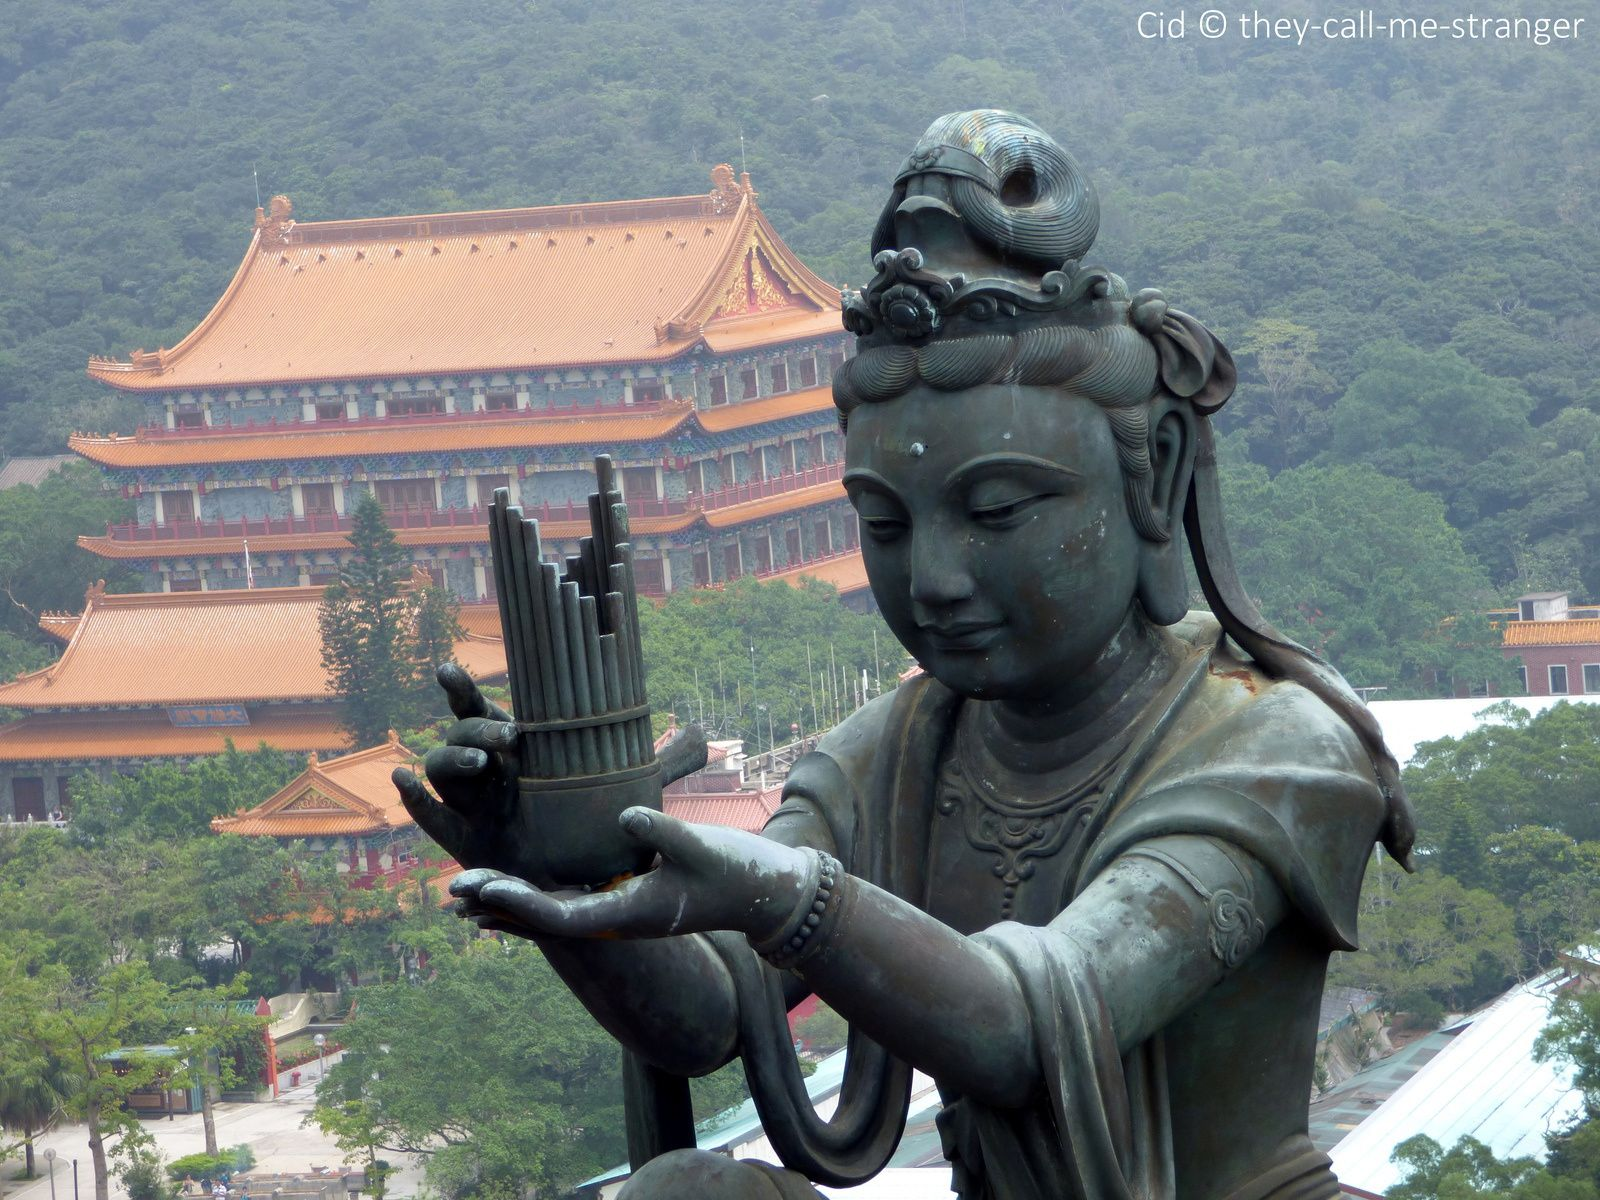 Le Monastère Po Lin et son Grand Bouddha, Lantau Island